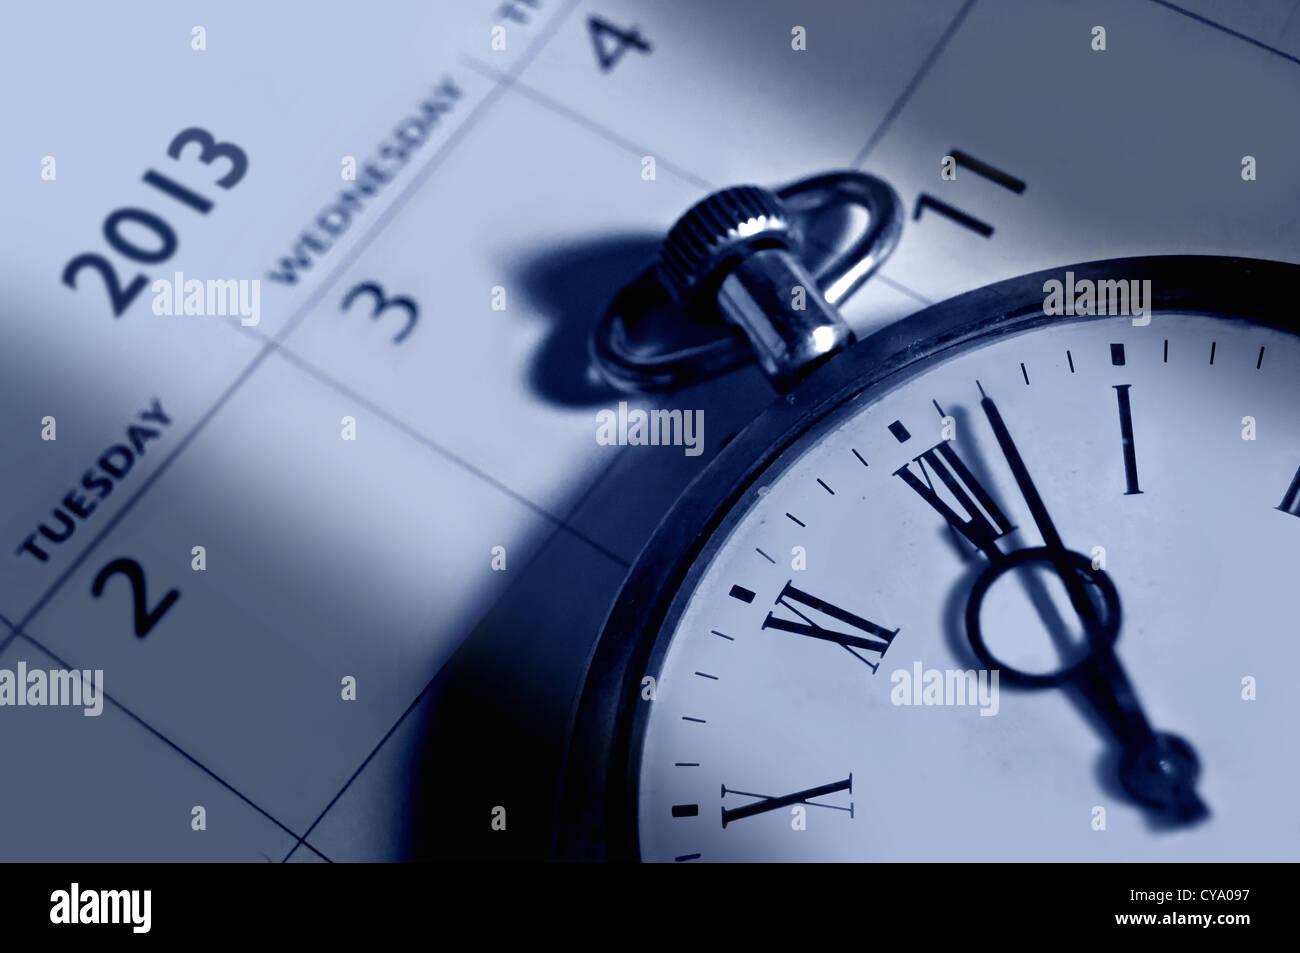 2013 calendar - Stock Image